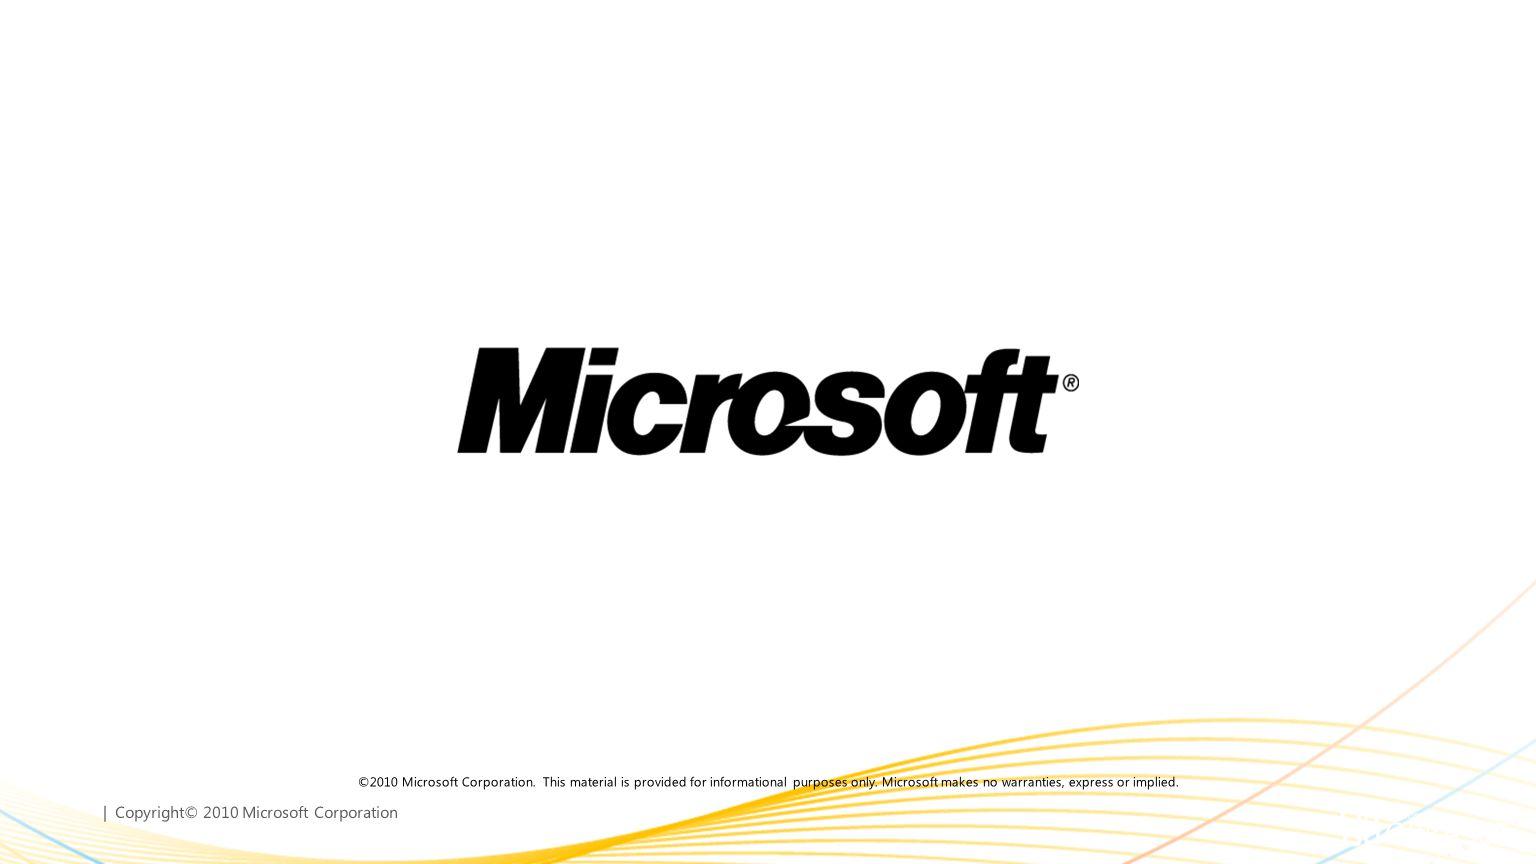 | Copyright© 2010 Microsoft Corporation